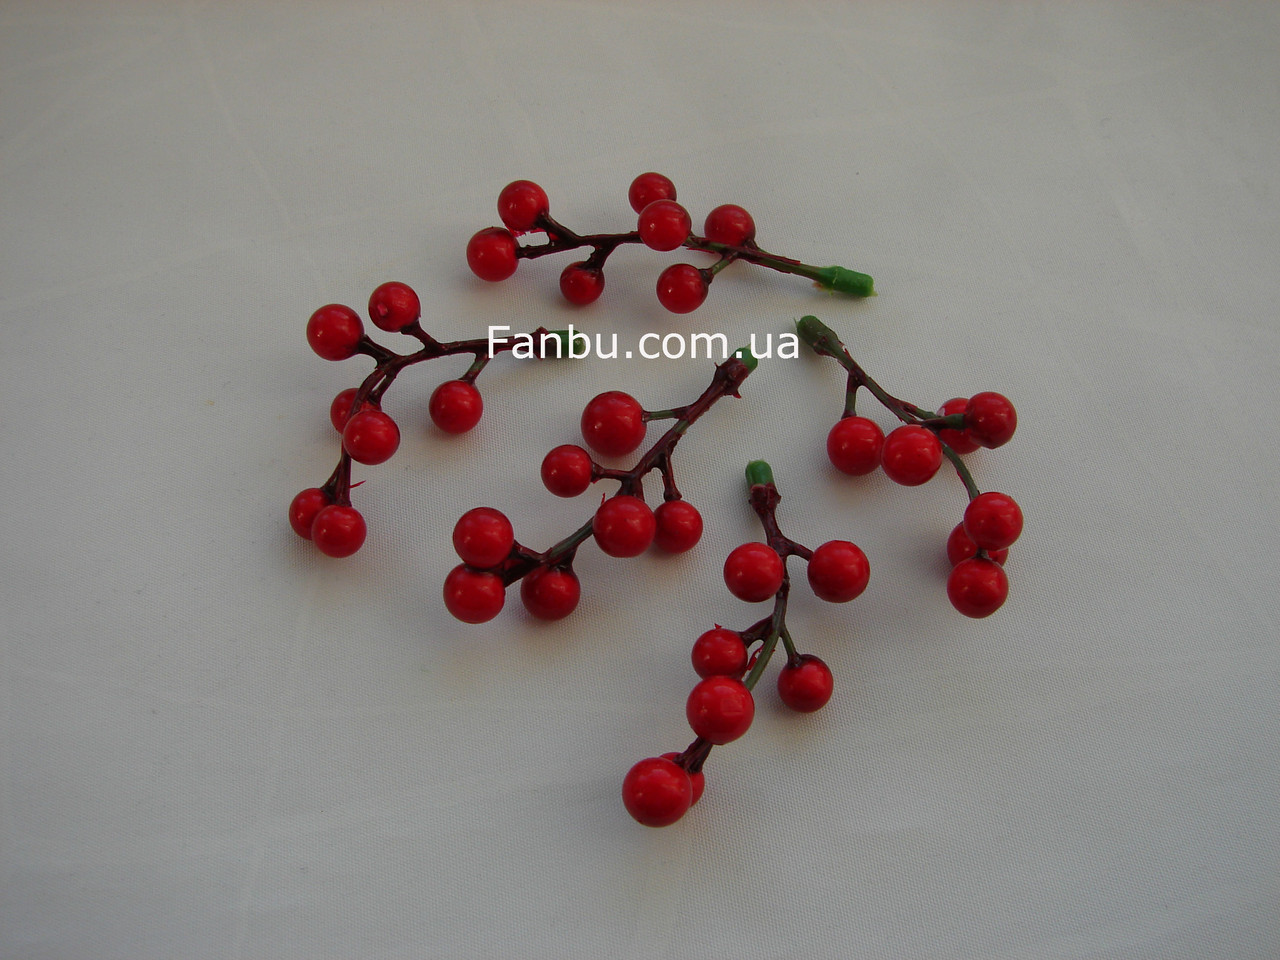 Мини-ветка ягод смородина, h-7 см (1 упаковка- 5 шт), фото 1